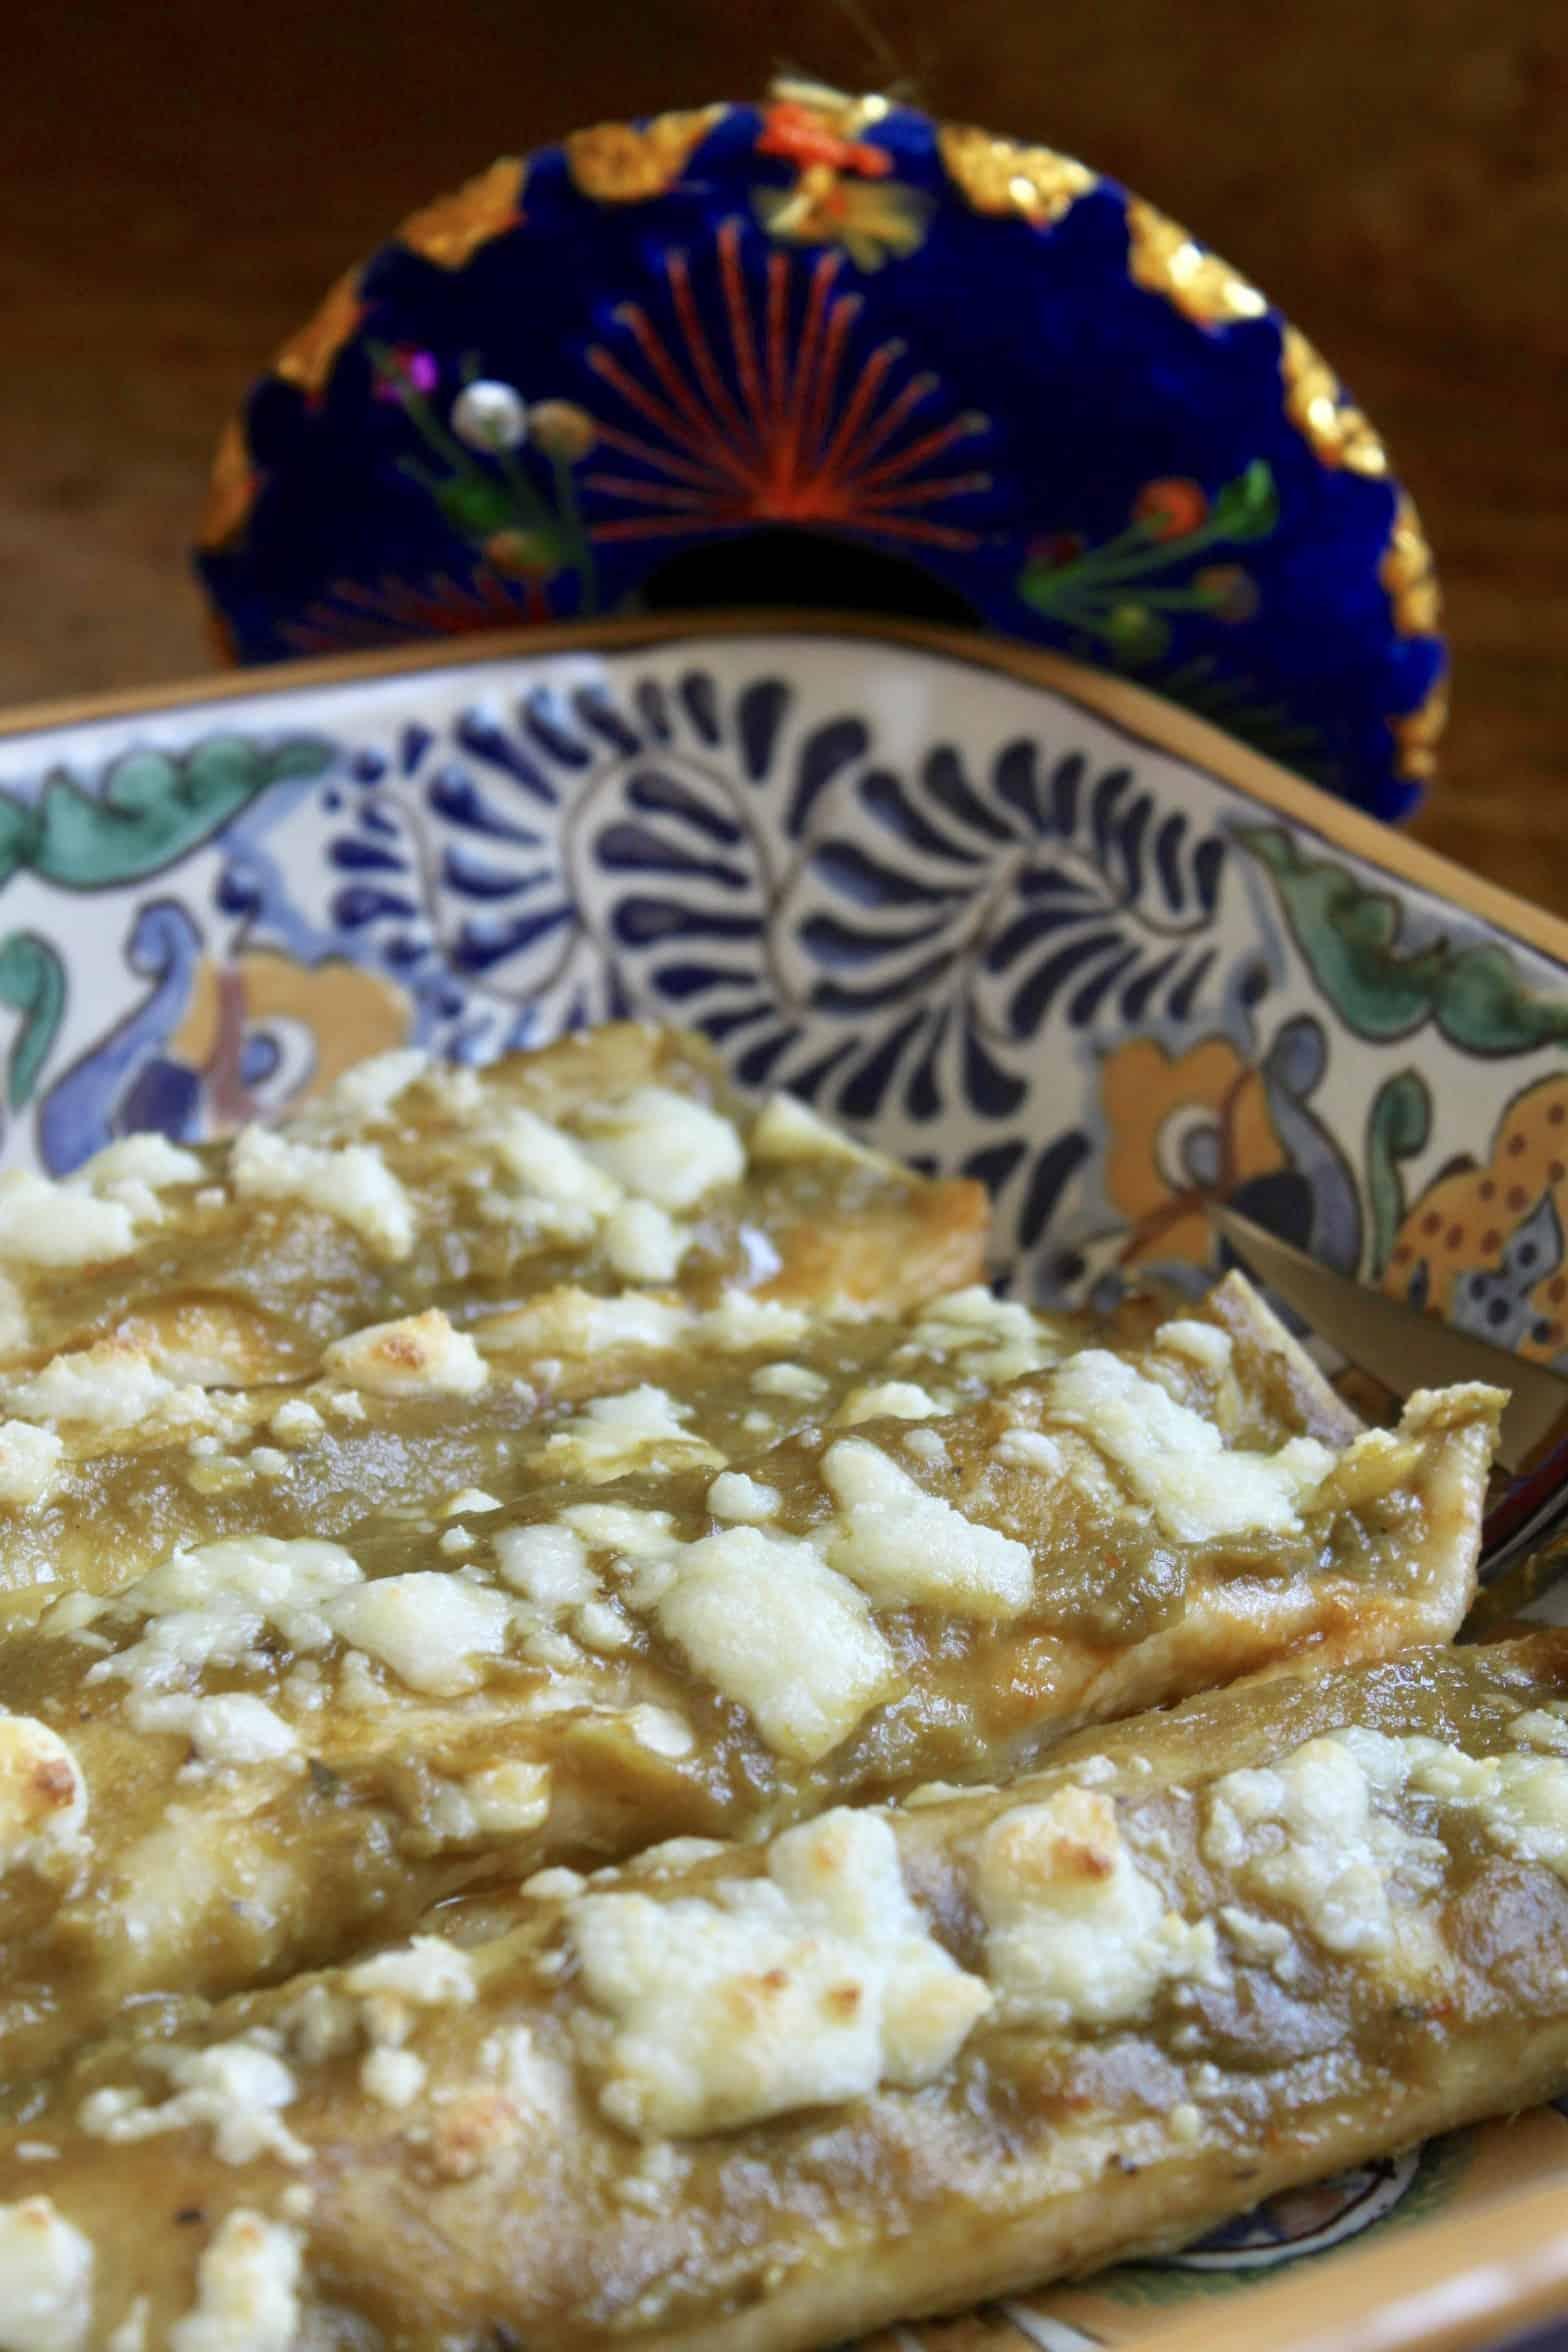 enchiladas in a Mexican dish